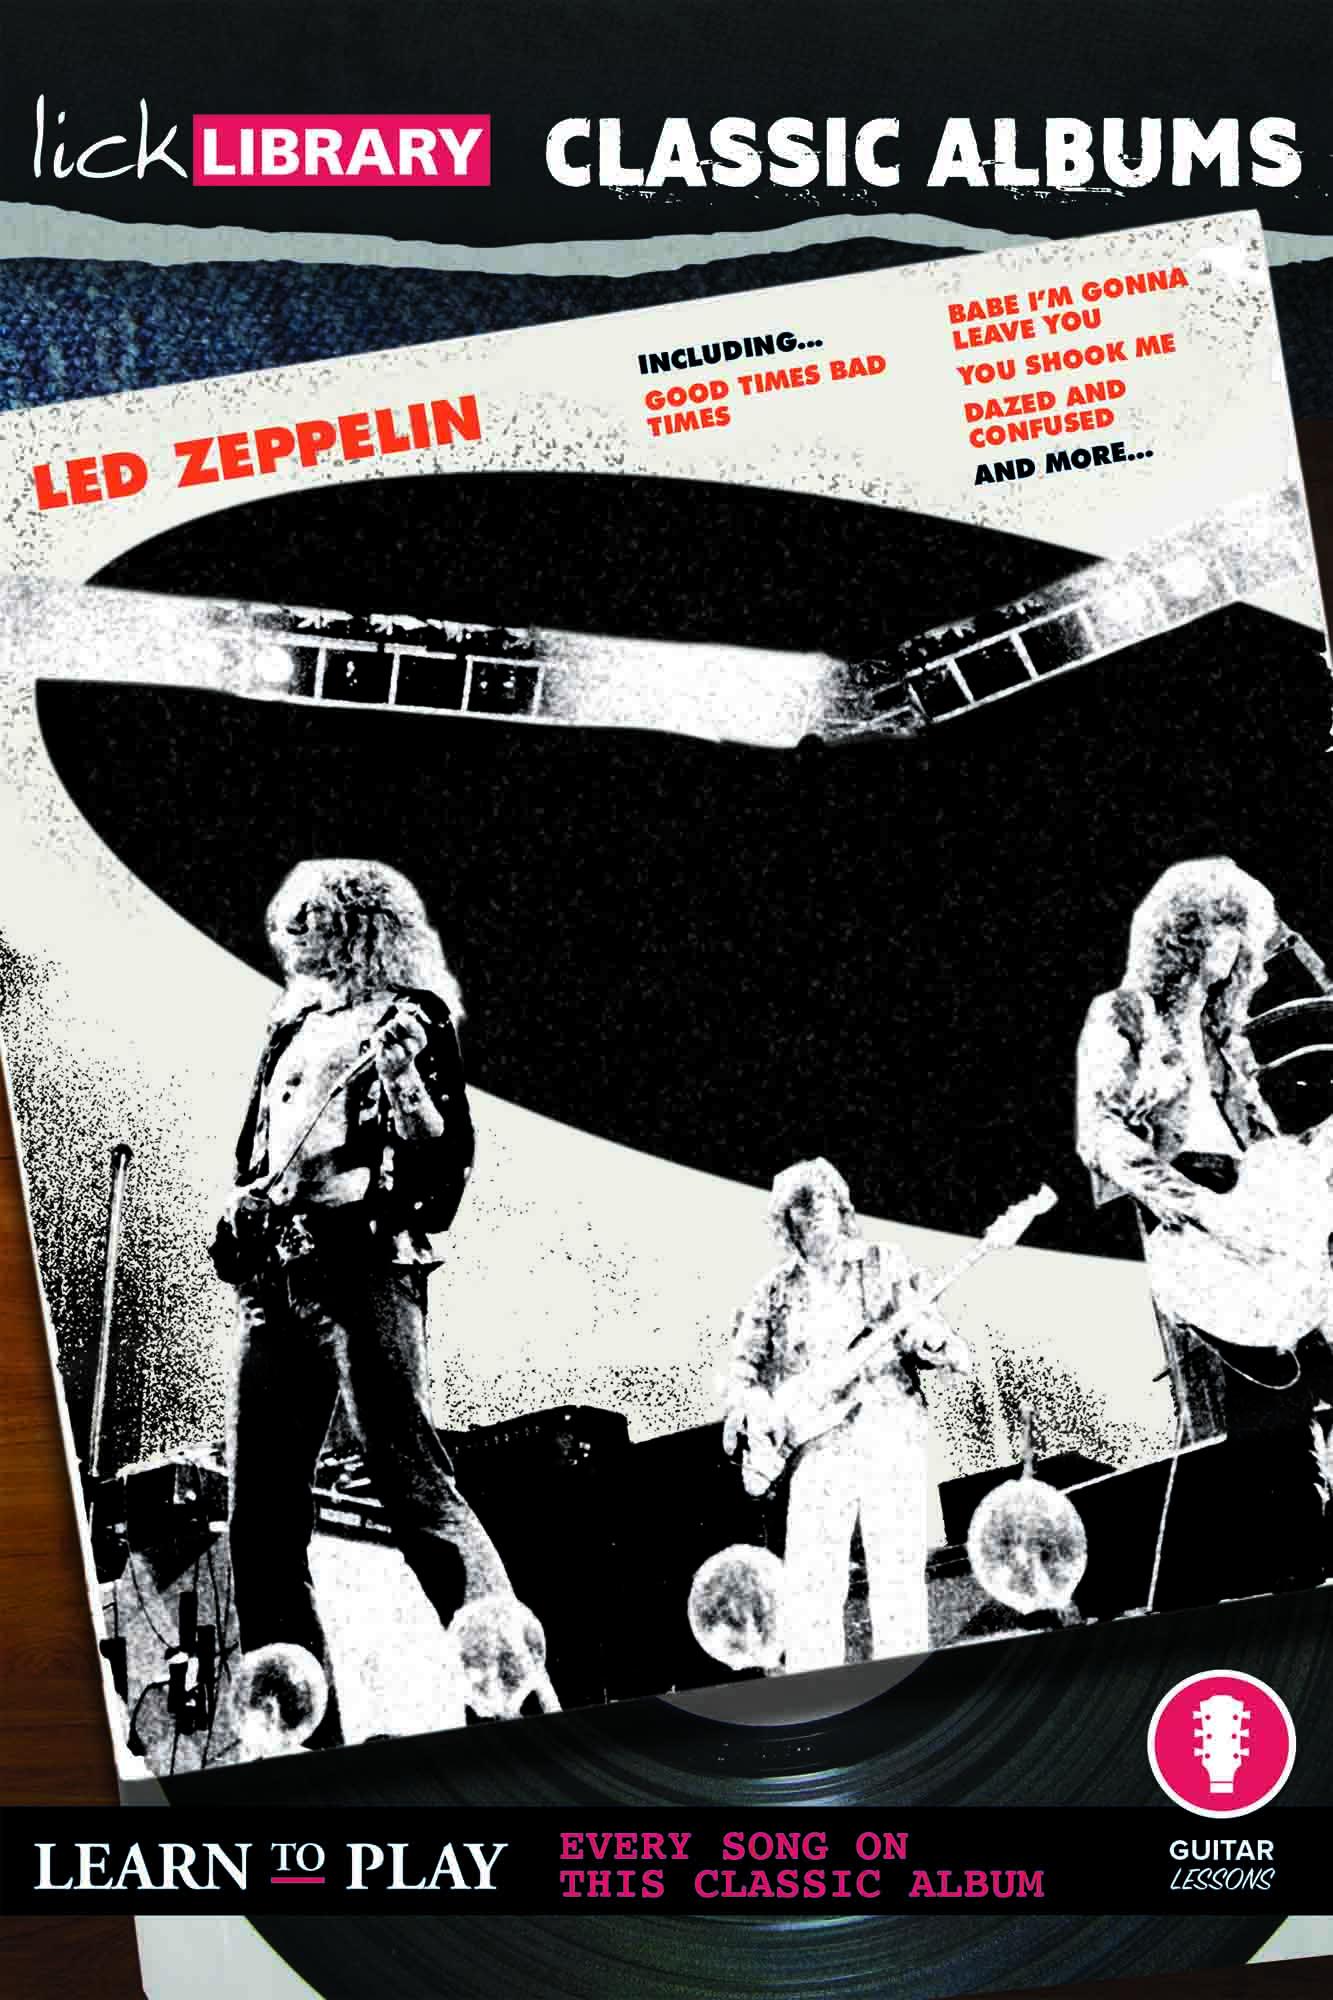 Classic Albums - Led Zeppelin I